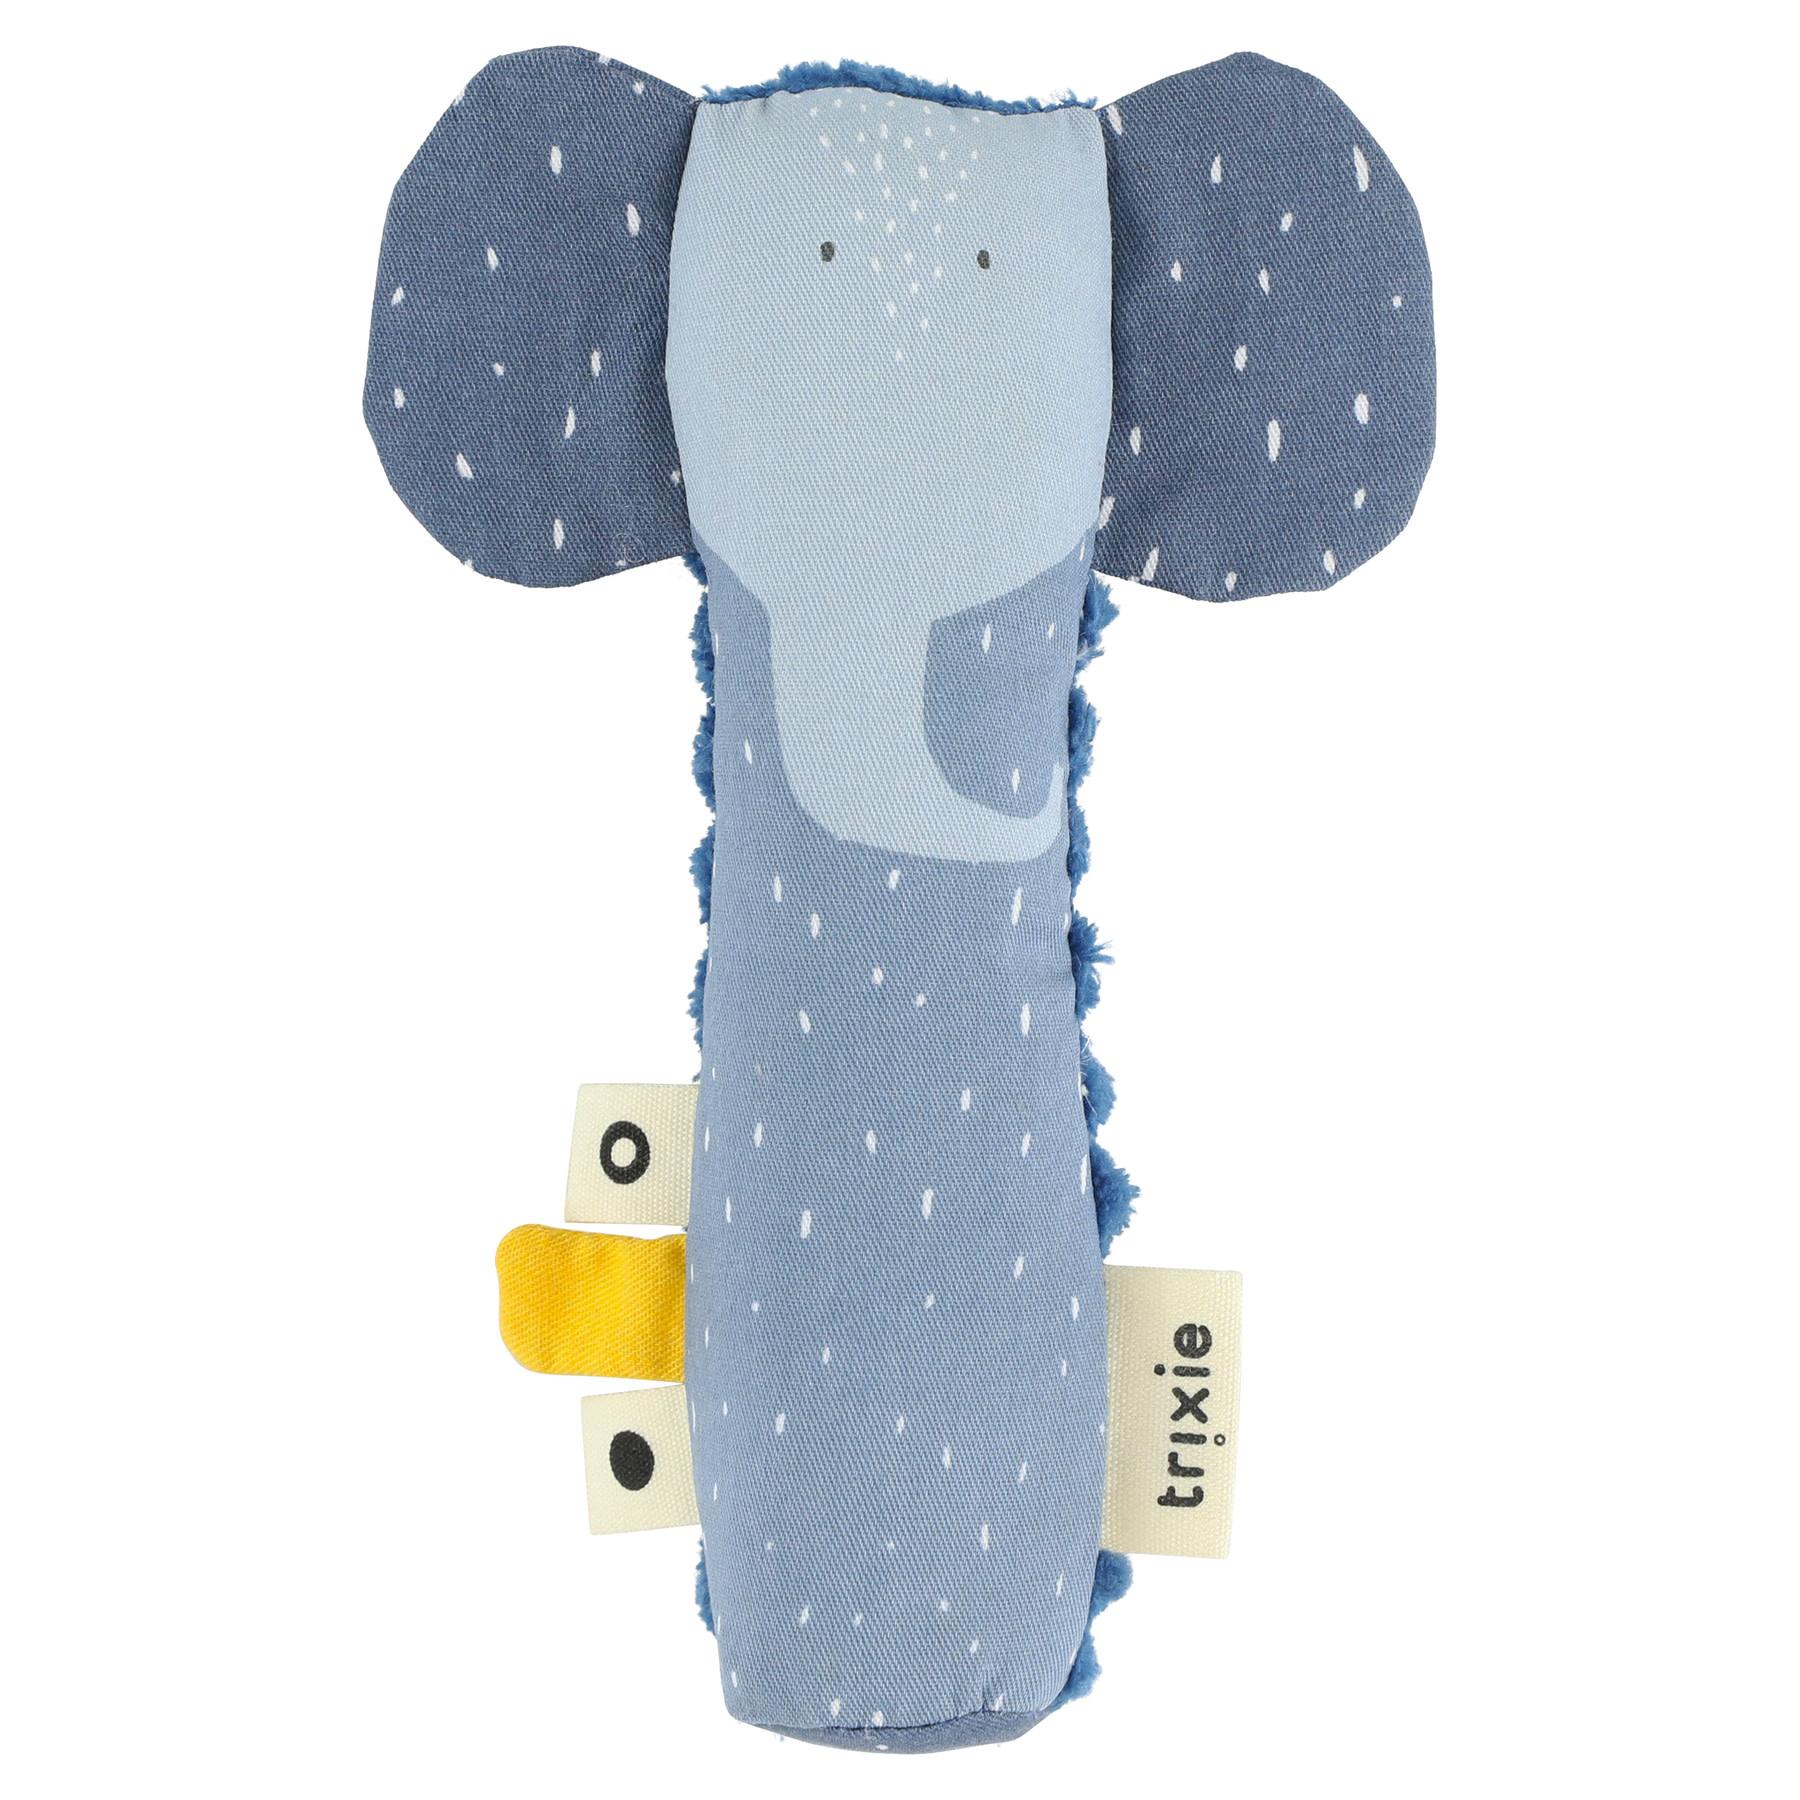 Pieper mrs. elephant-1